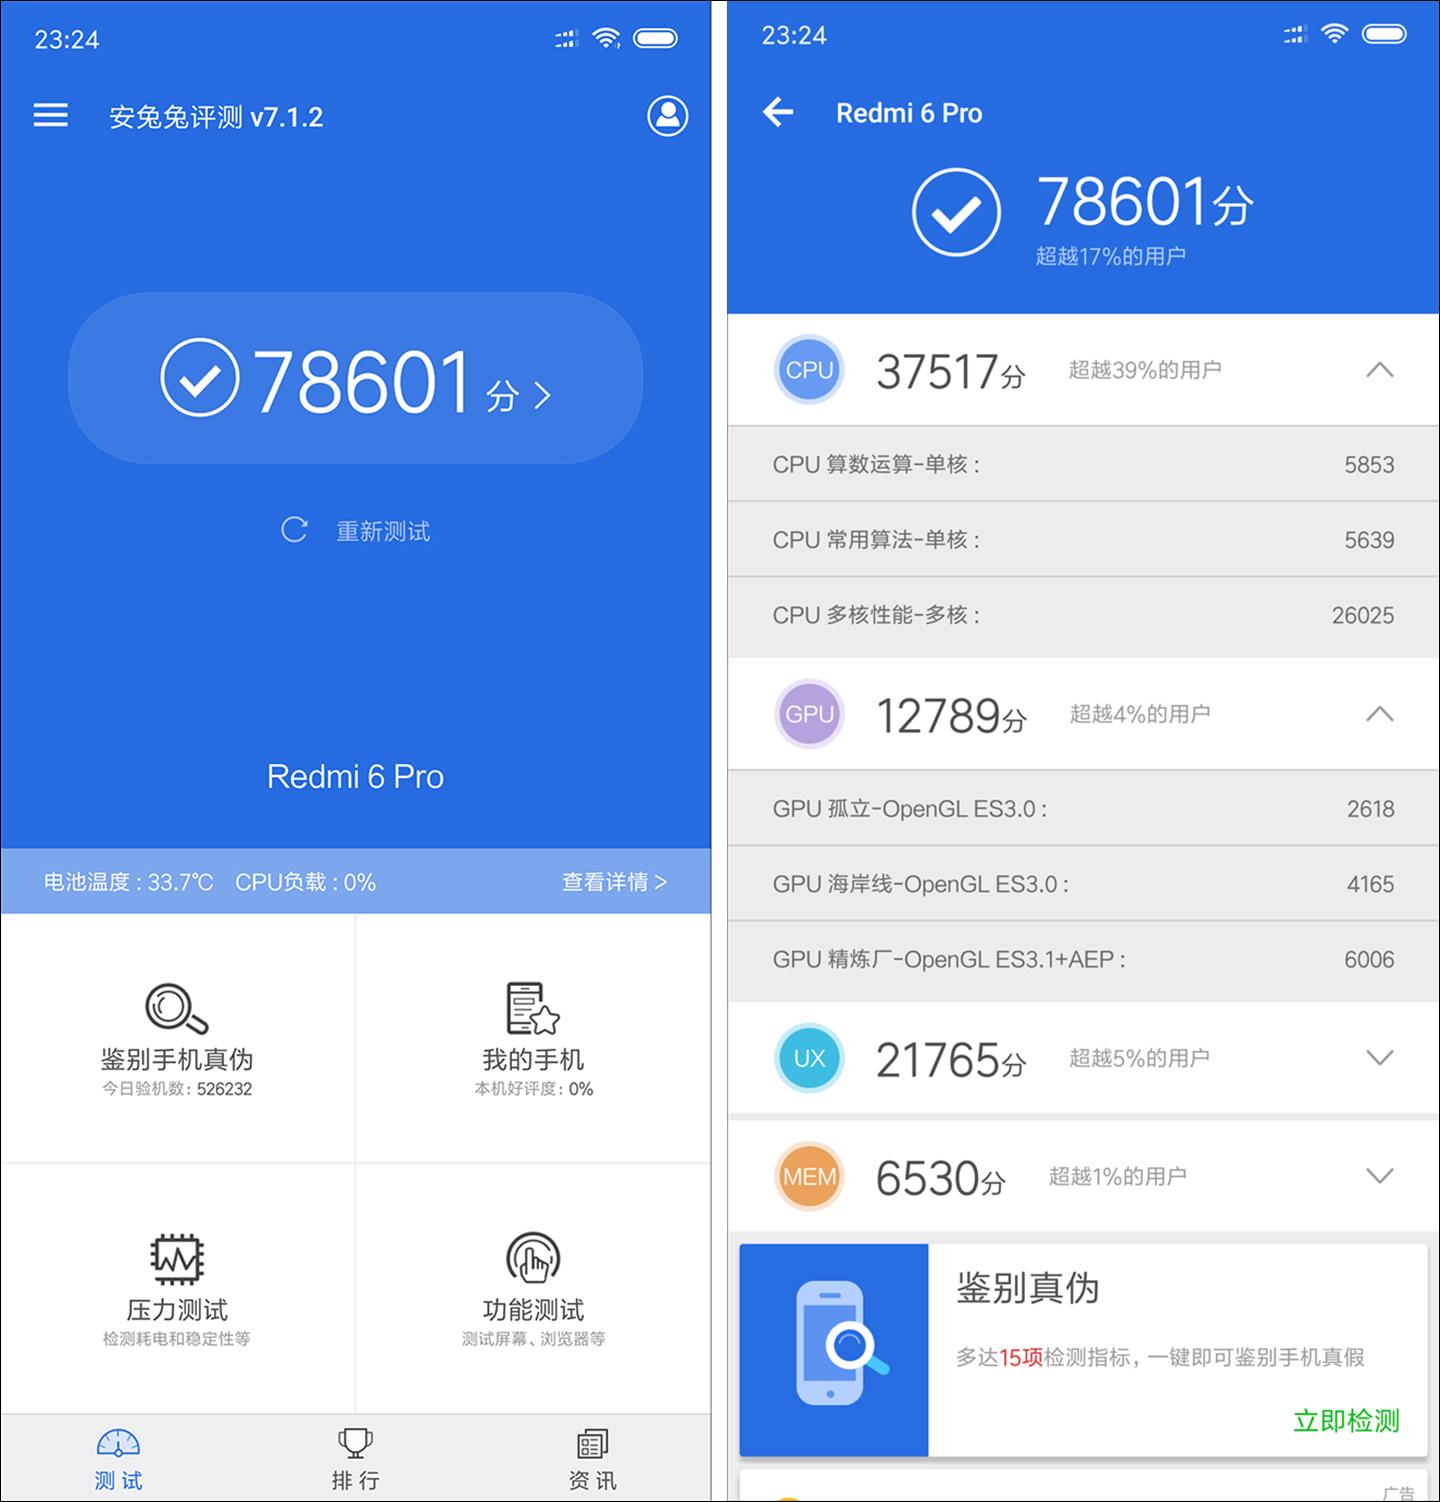 红米6 Pro评测:4000mAh电池,FHD+屏幕,满意吗?